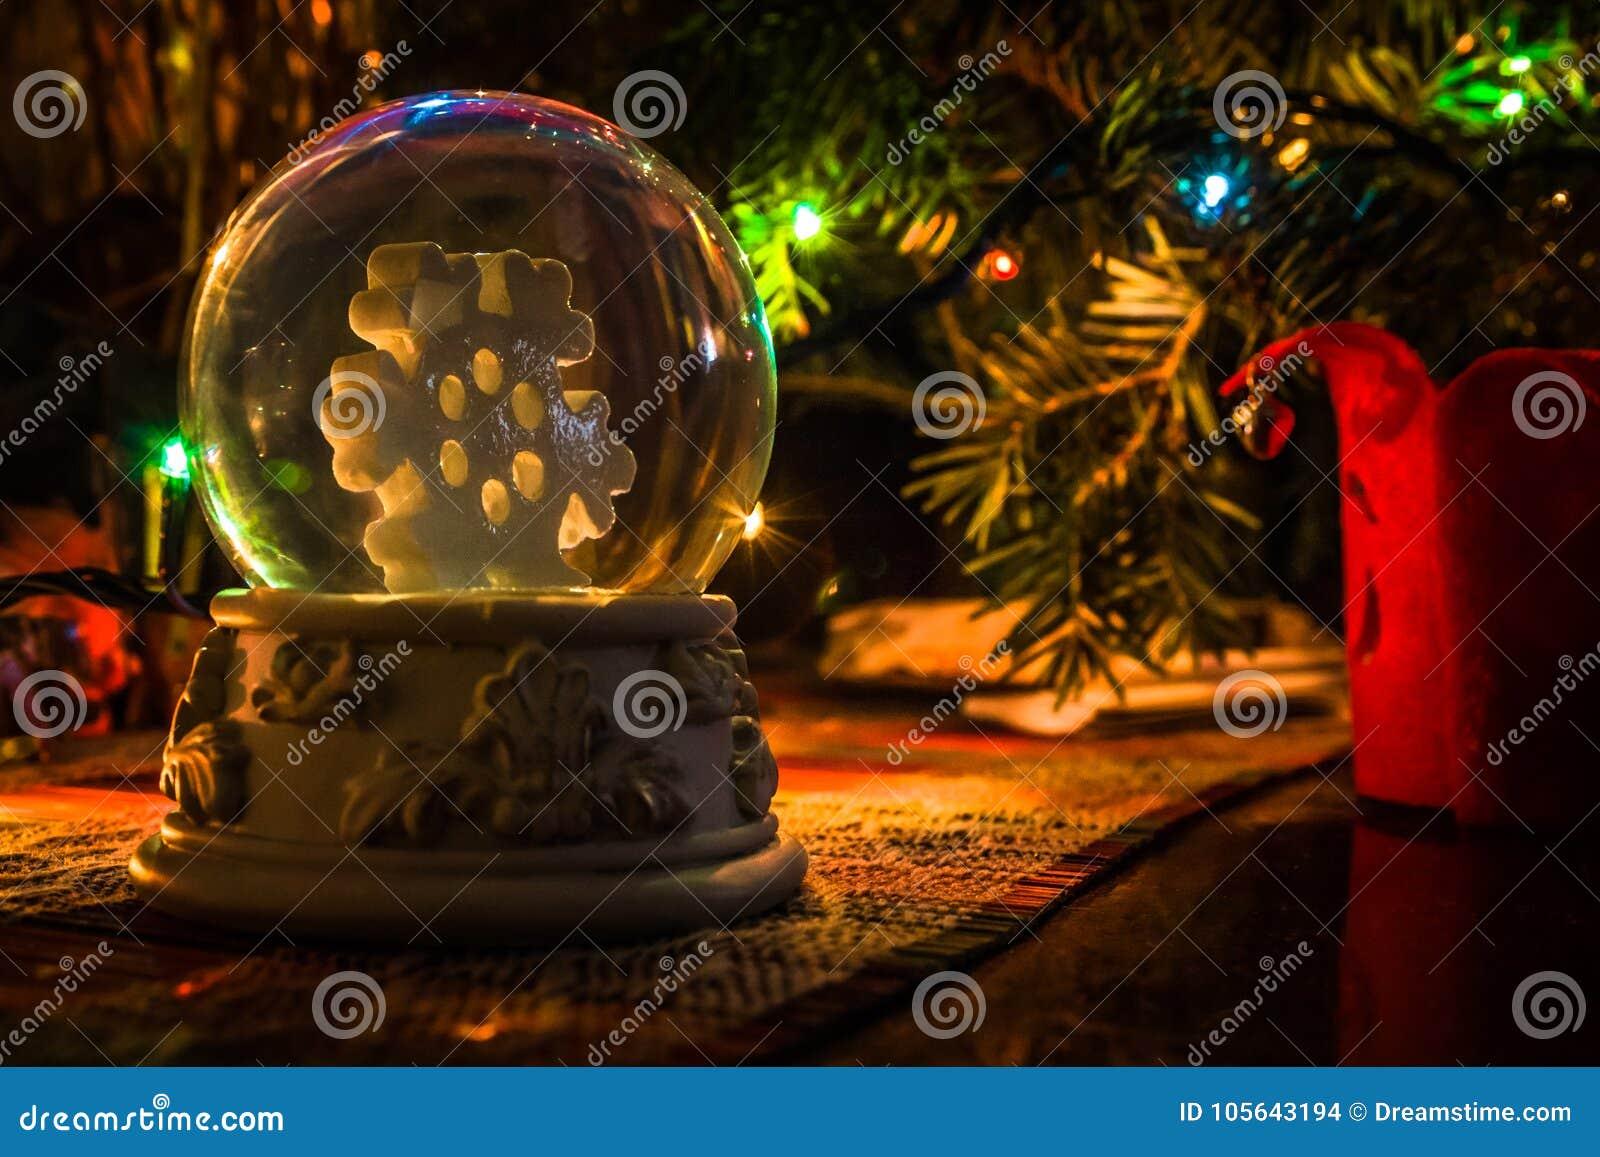 Colorful Christmas Lights Aesthetic.Christmas Snow Globe Perfect Aesthetics Stock Photo Image